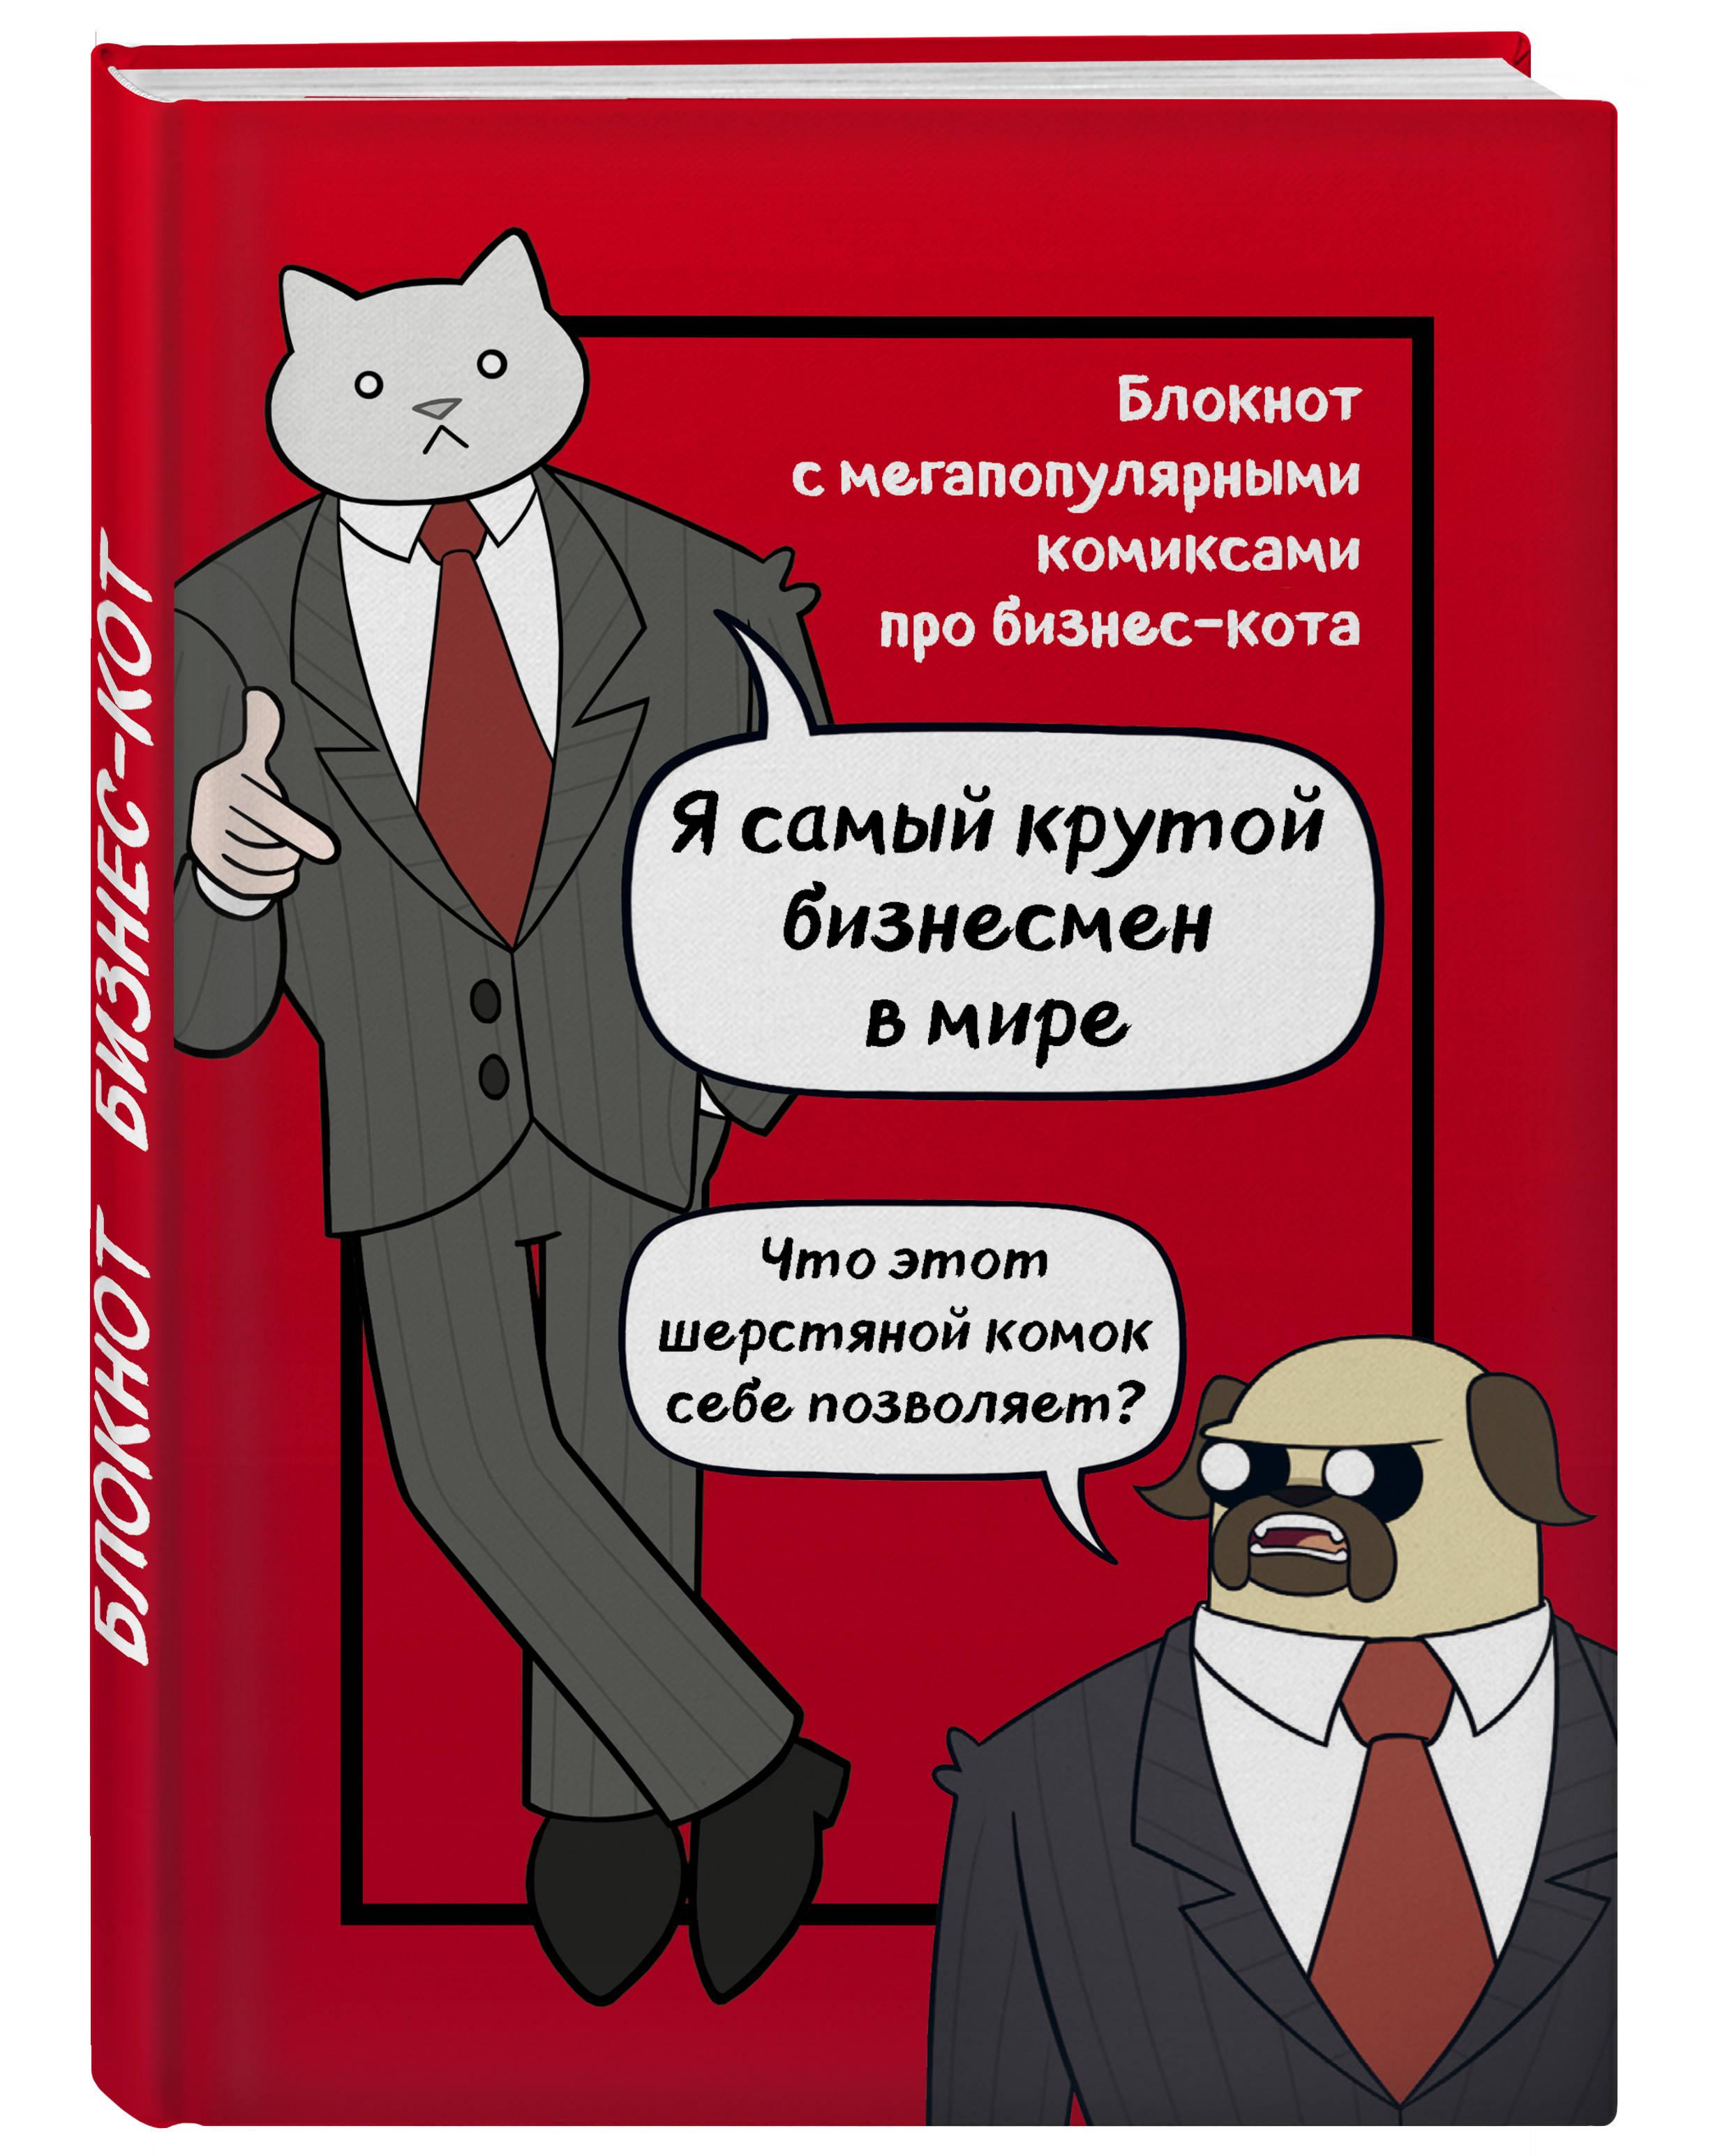 Бизнес-кот. Блокнот с комиксами deli гастроном 3186 бизнес офис кожа блокнот конференц зал notebook 25k 160 е браун